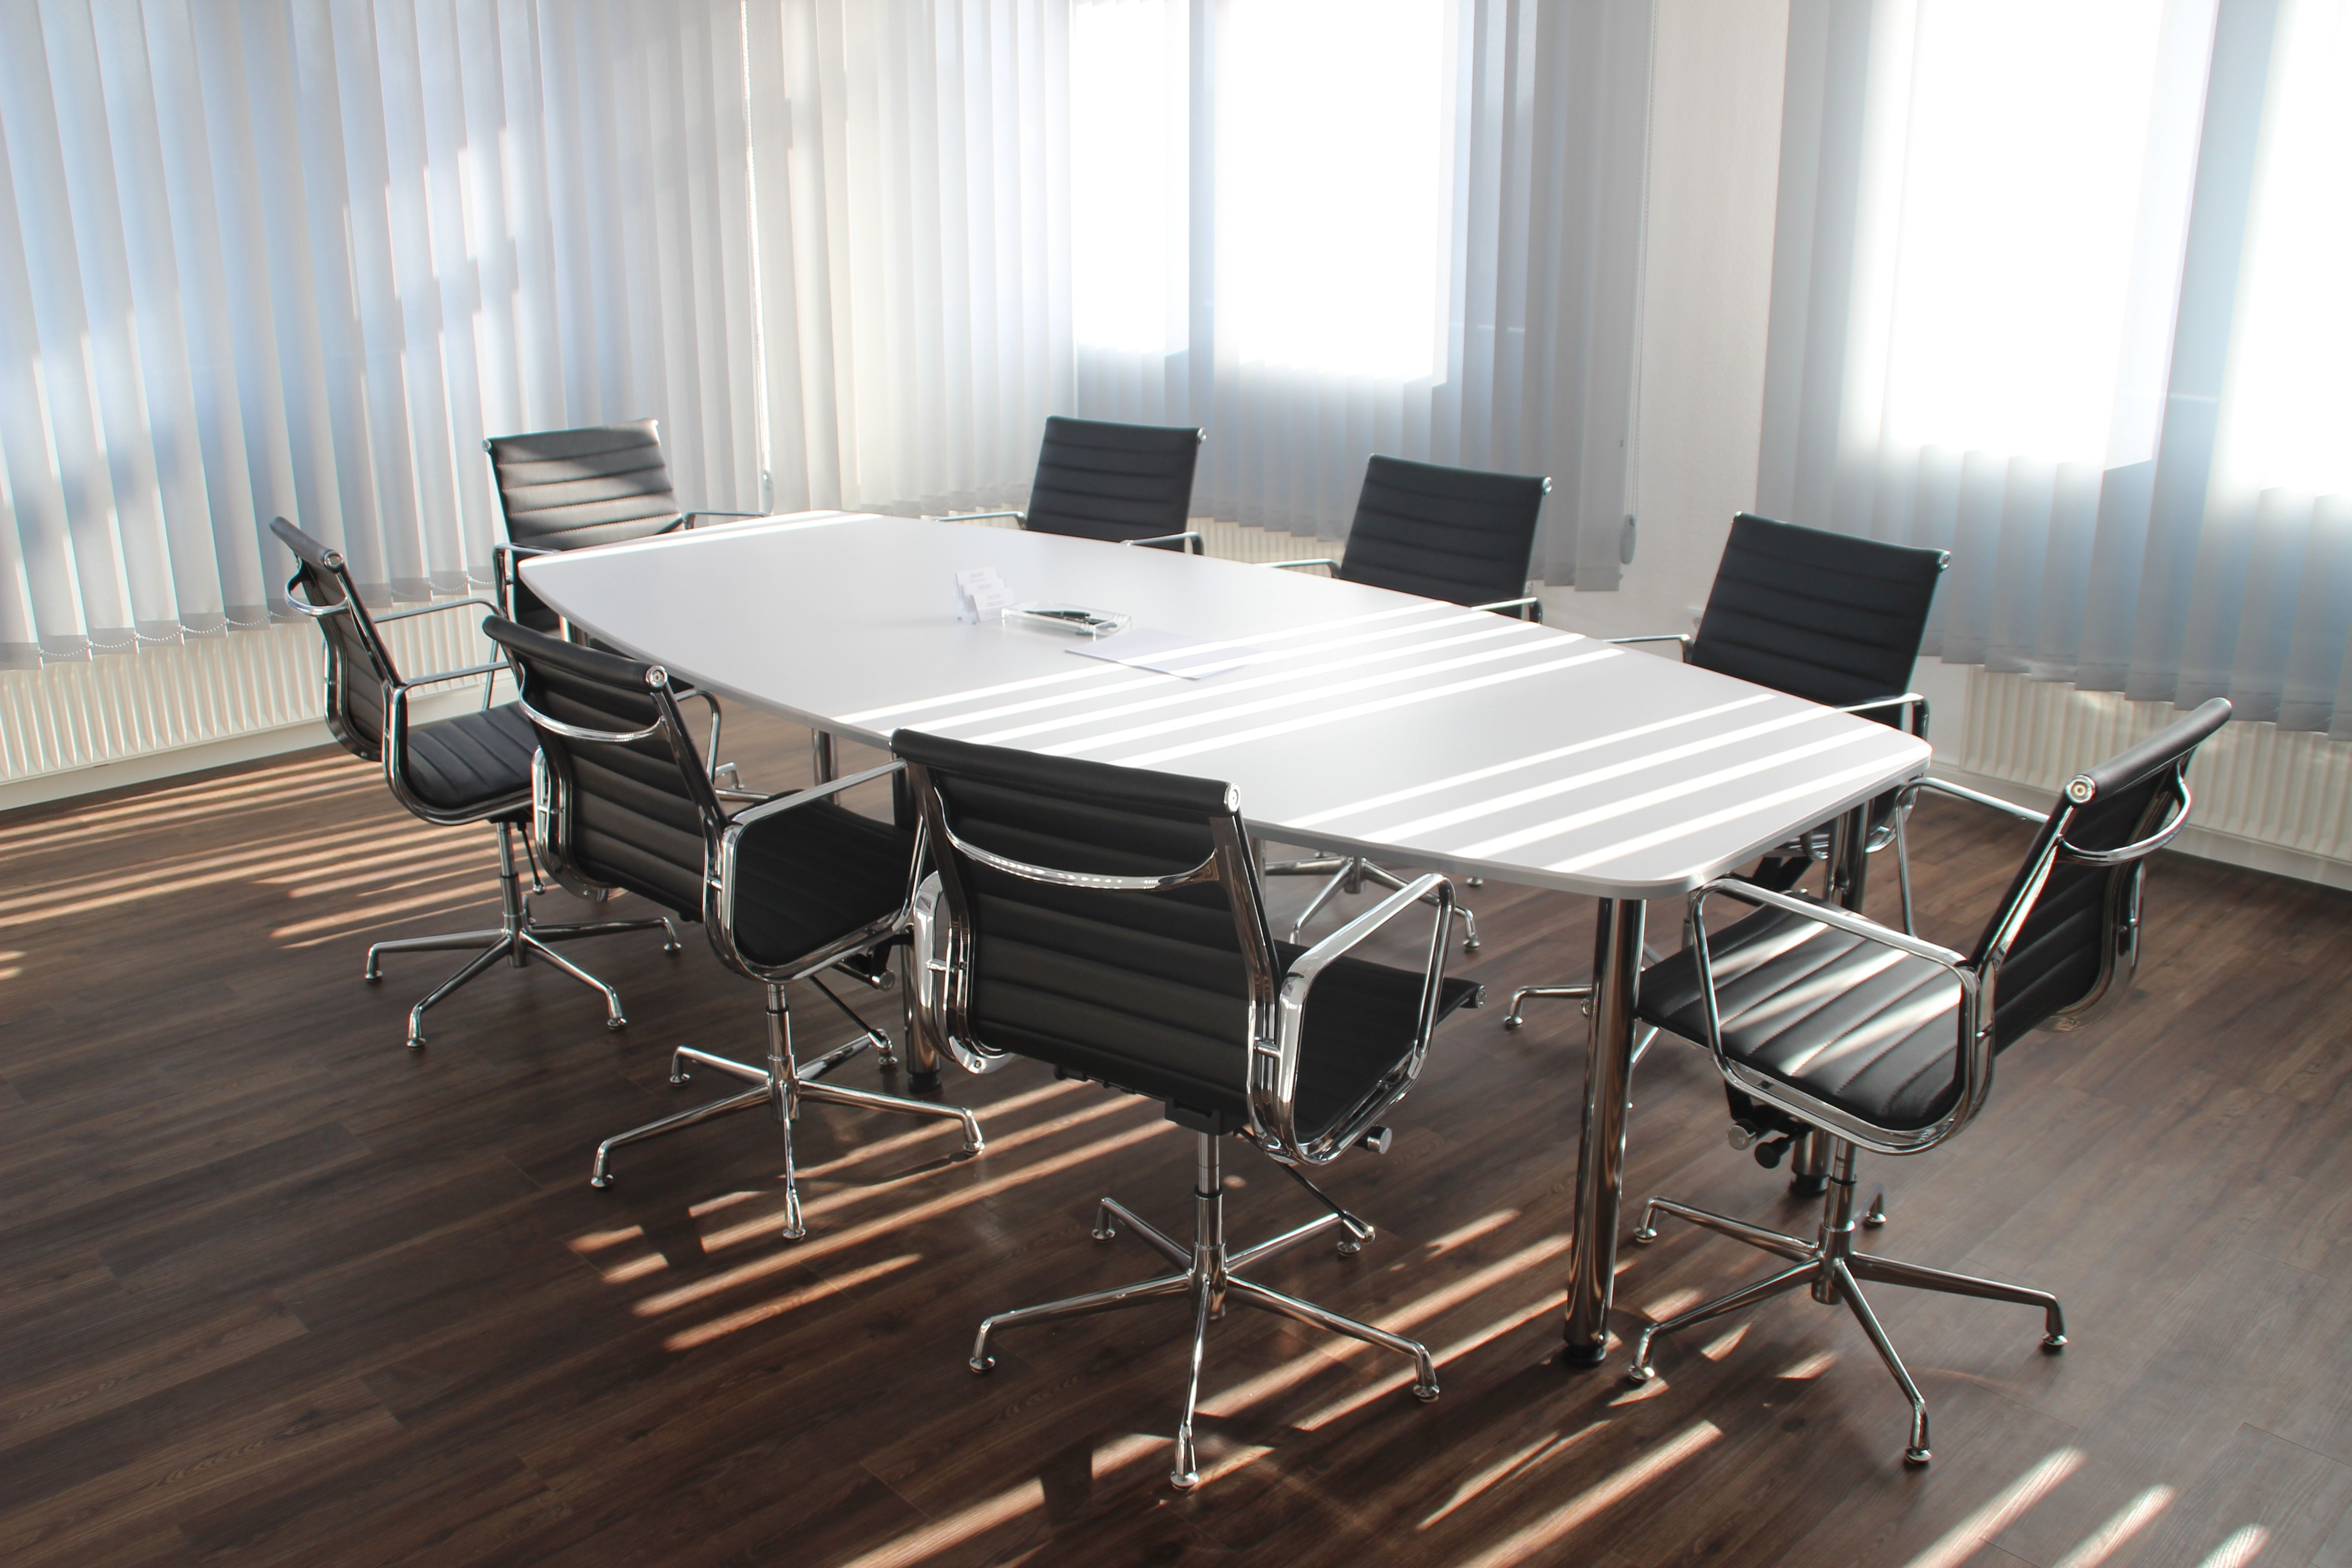 Wonderful Free Stock Photo Of Desk, Office, Designer, Table